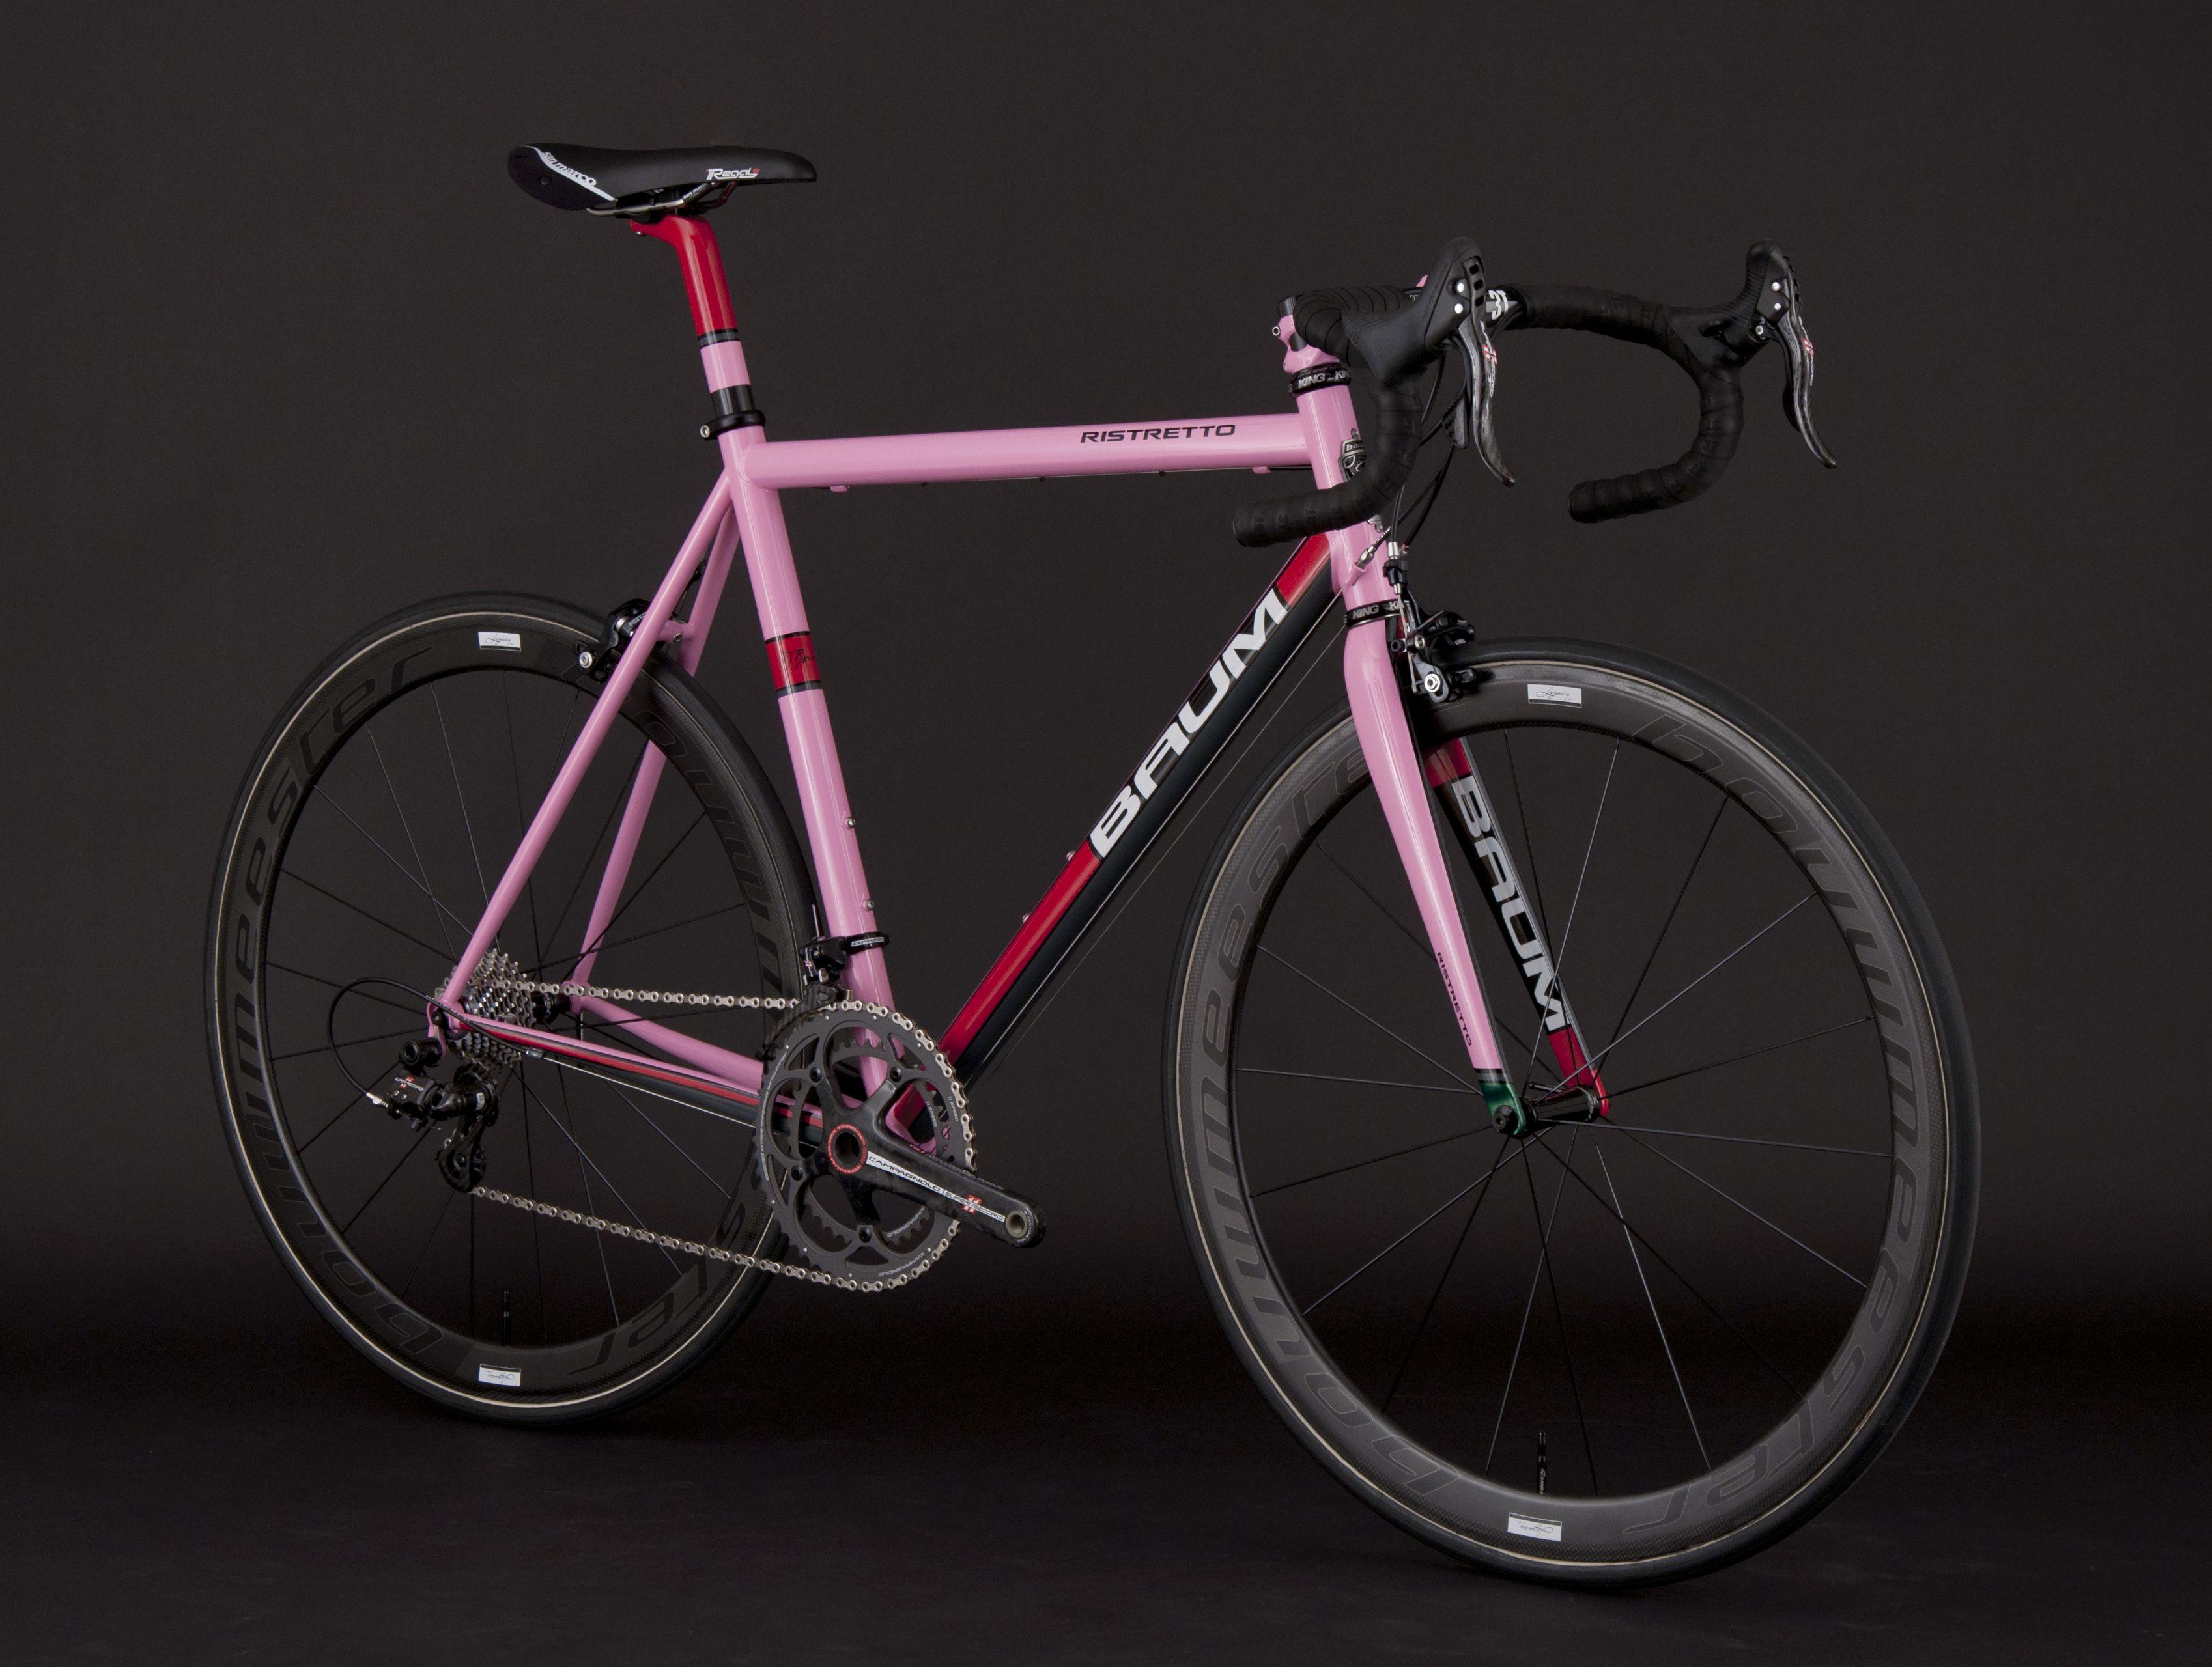 Gta Pink Red Ristretto Titanium Road Bike Pink Bike Road Bikes